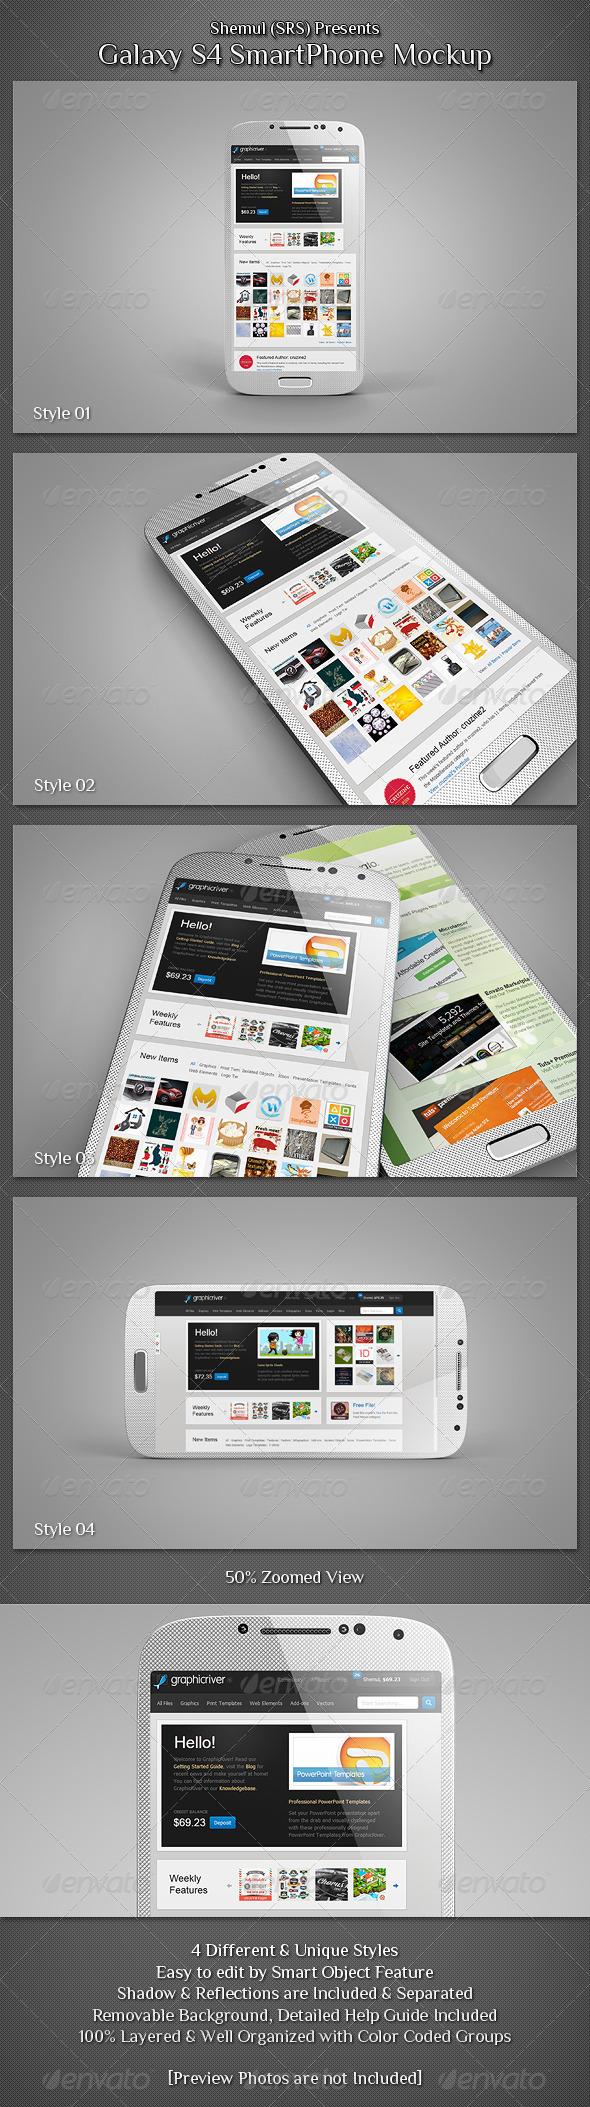 Galaxy S4 Smartphone Mockup - Mobile Displays